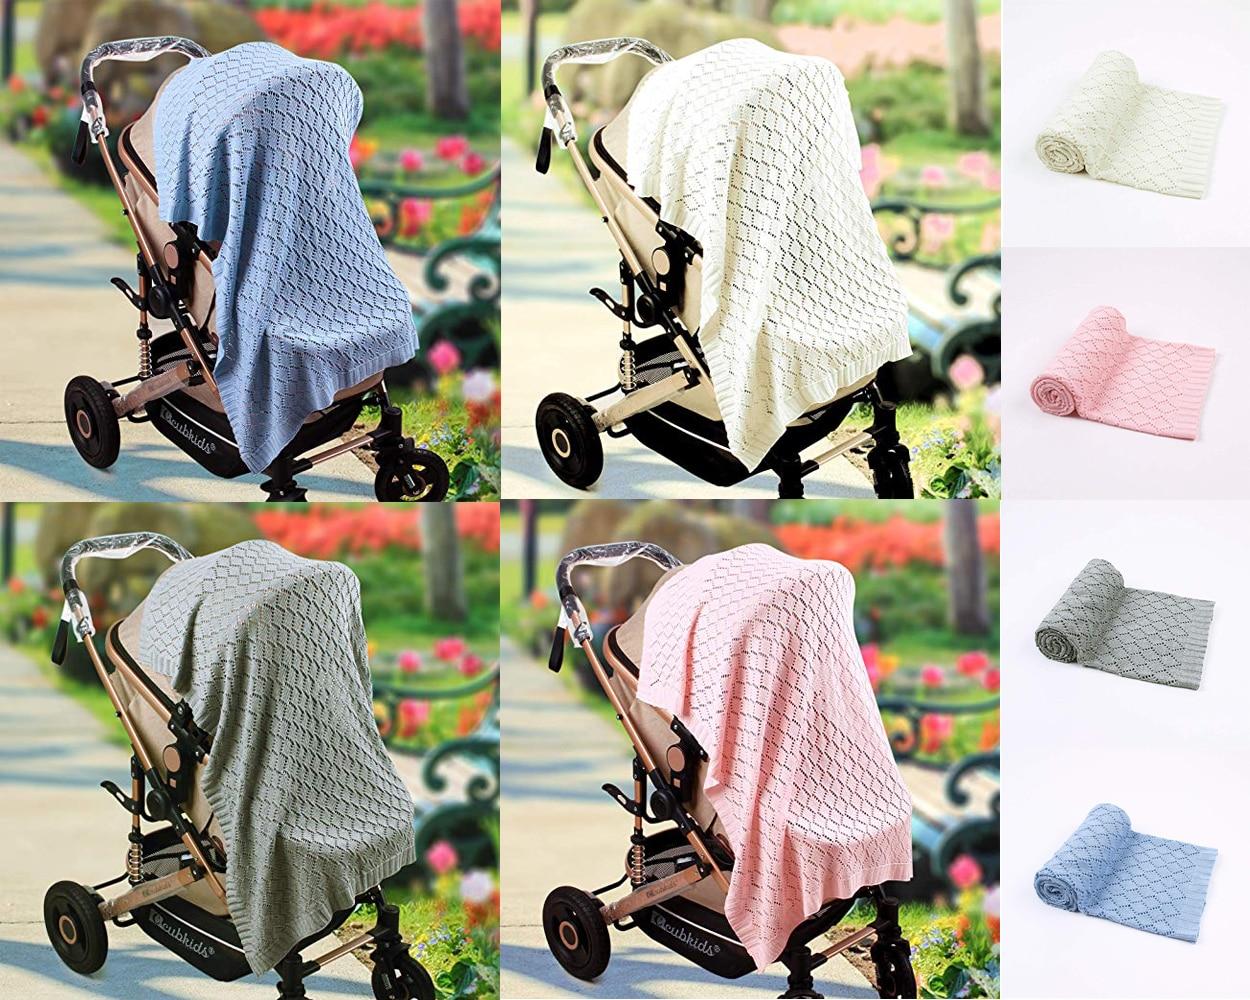 Newborn Baby Boy Girl Blanket Swaddle Wrap Warm Blankets Soft Breathable Knitted Sleep Blankets